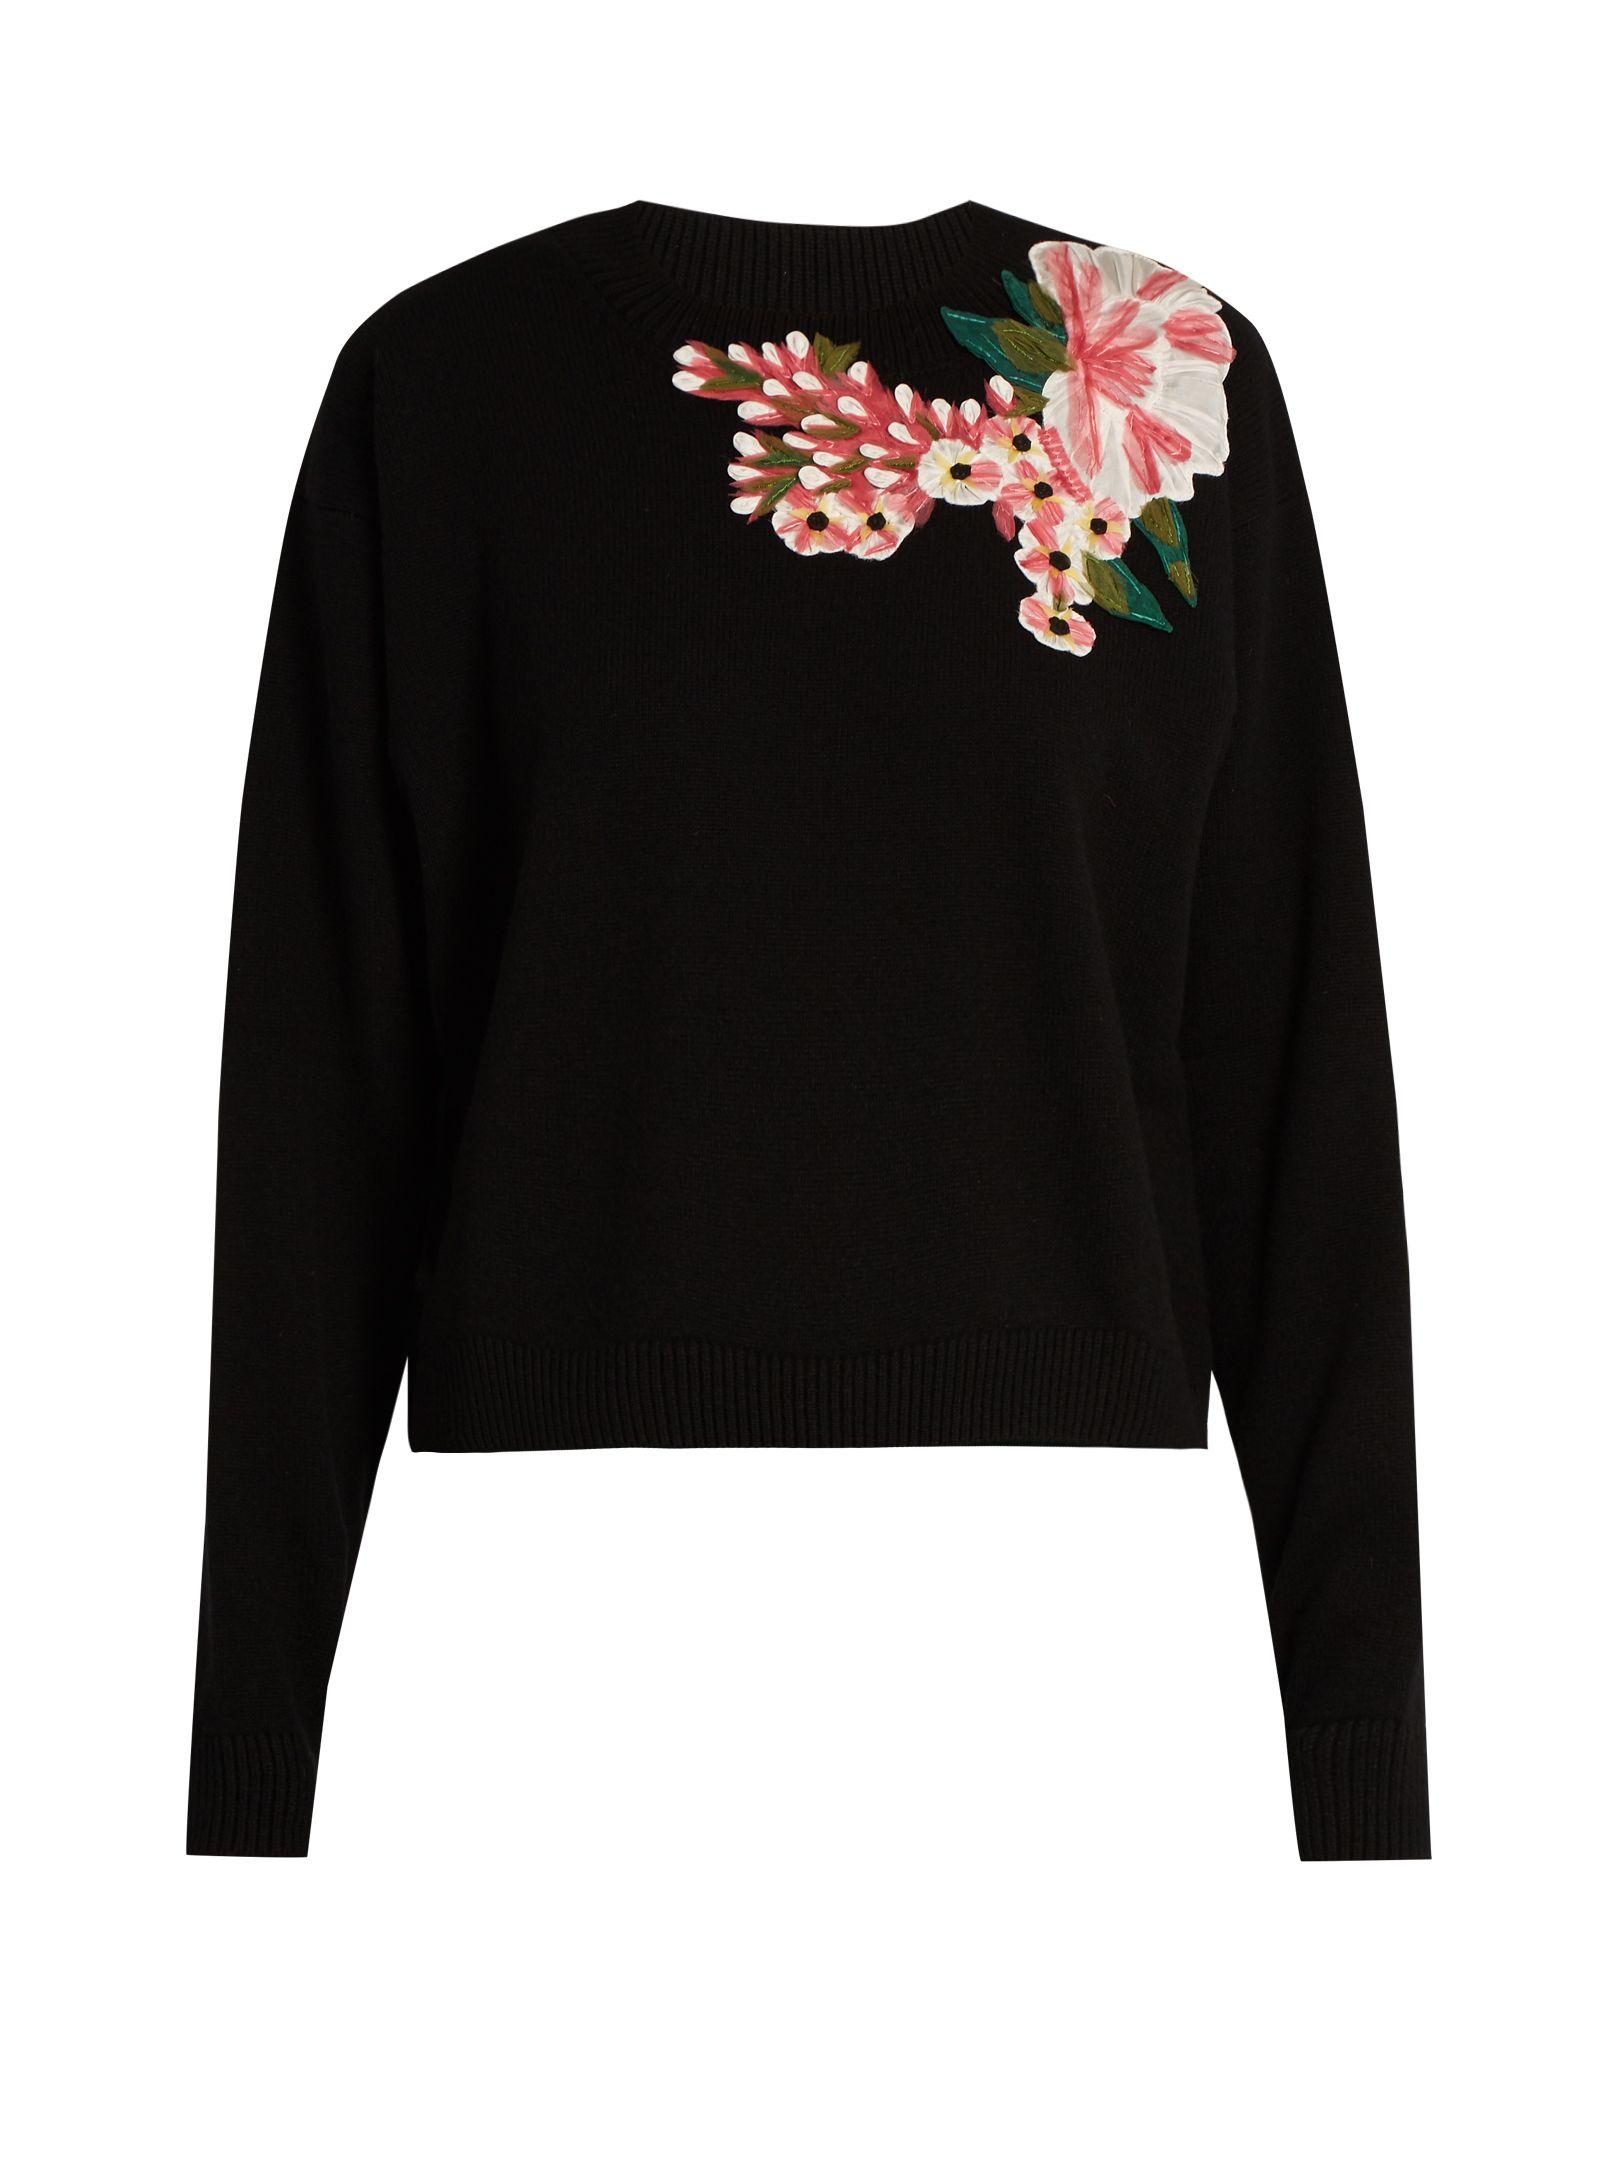 674e9021df9c50 Floral-appliqué wool and cashmere-blend sweater | Dolce & Gabbana |  MATCHESFASHION.COM UK